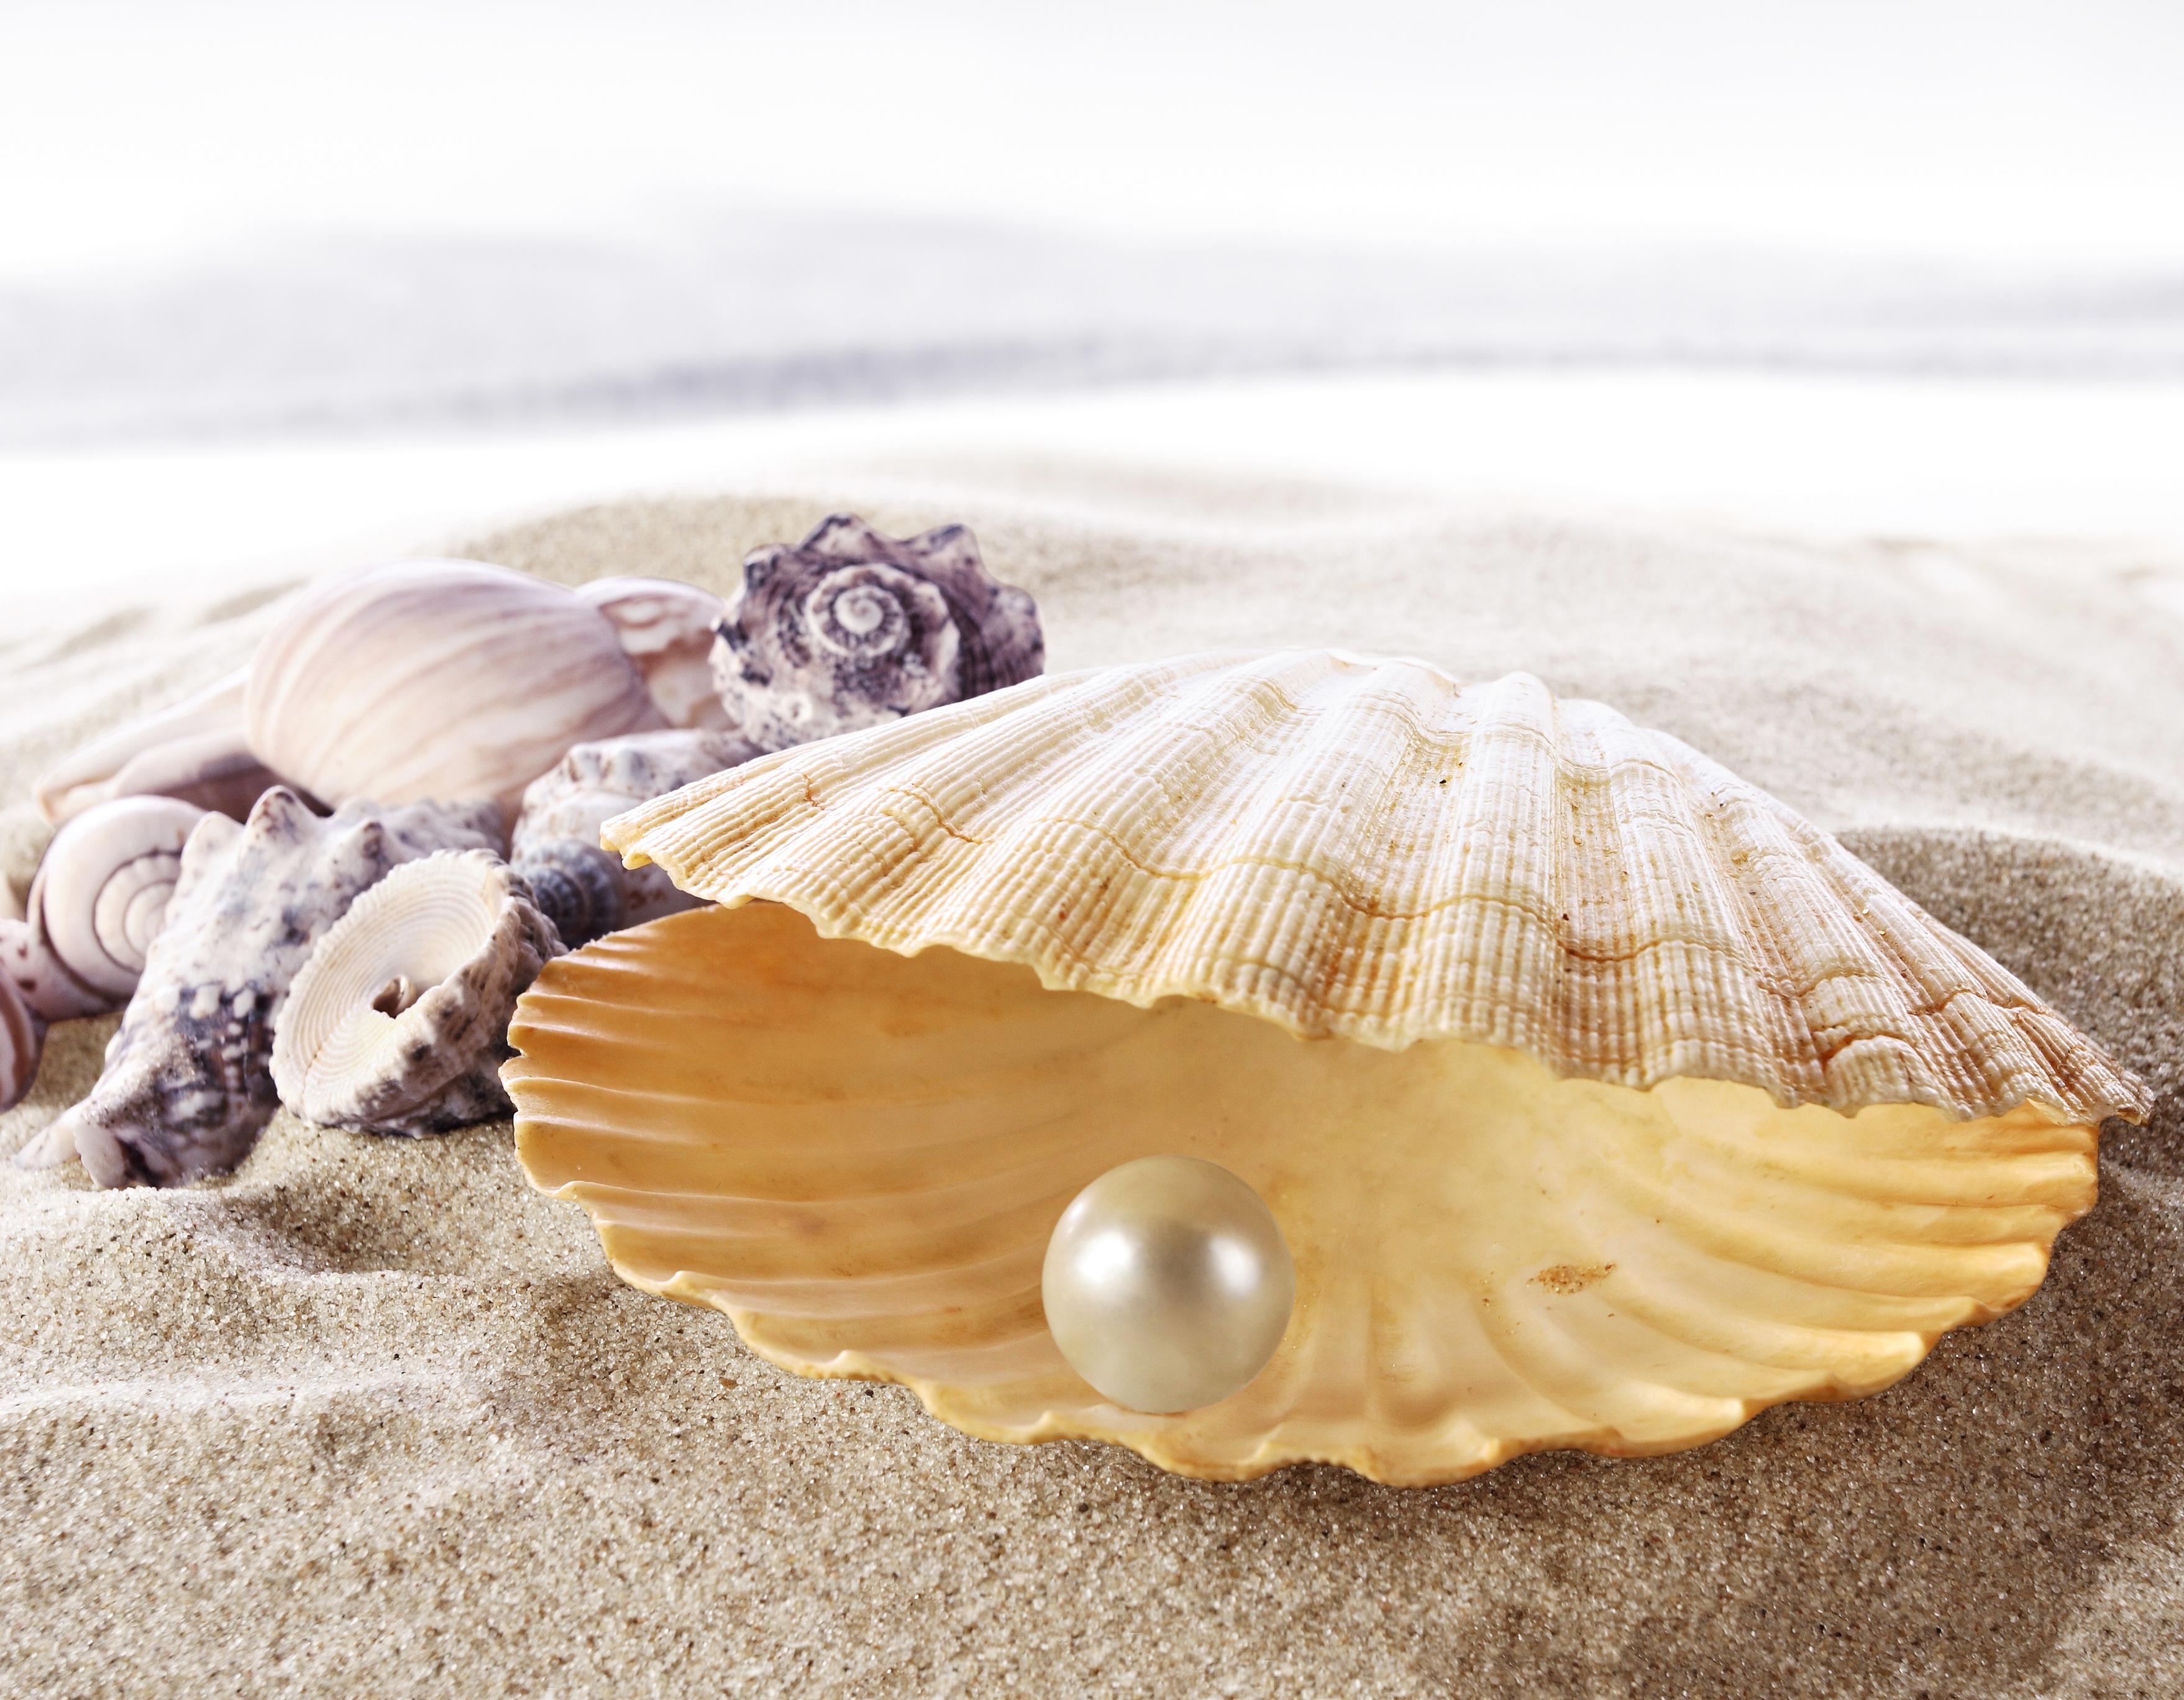 глядя море ракушки с жемчугом картинки сегодняшней статье поговорим